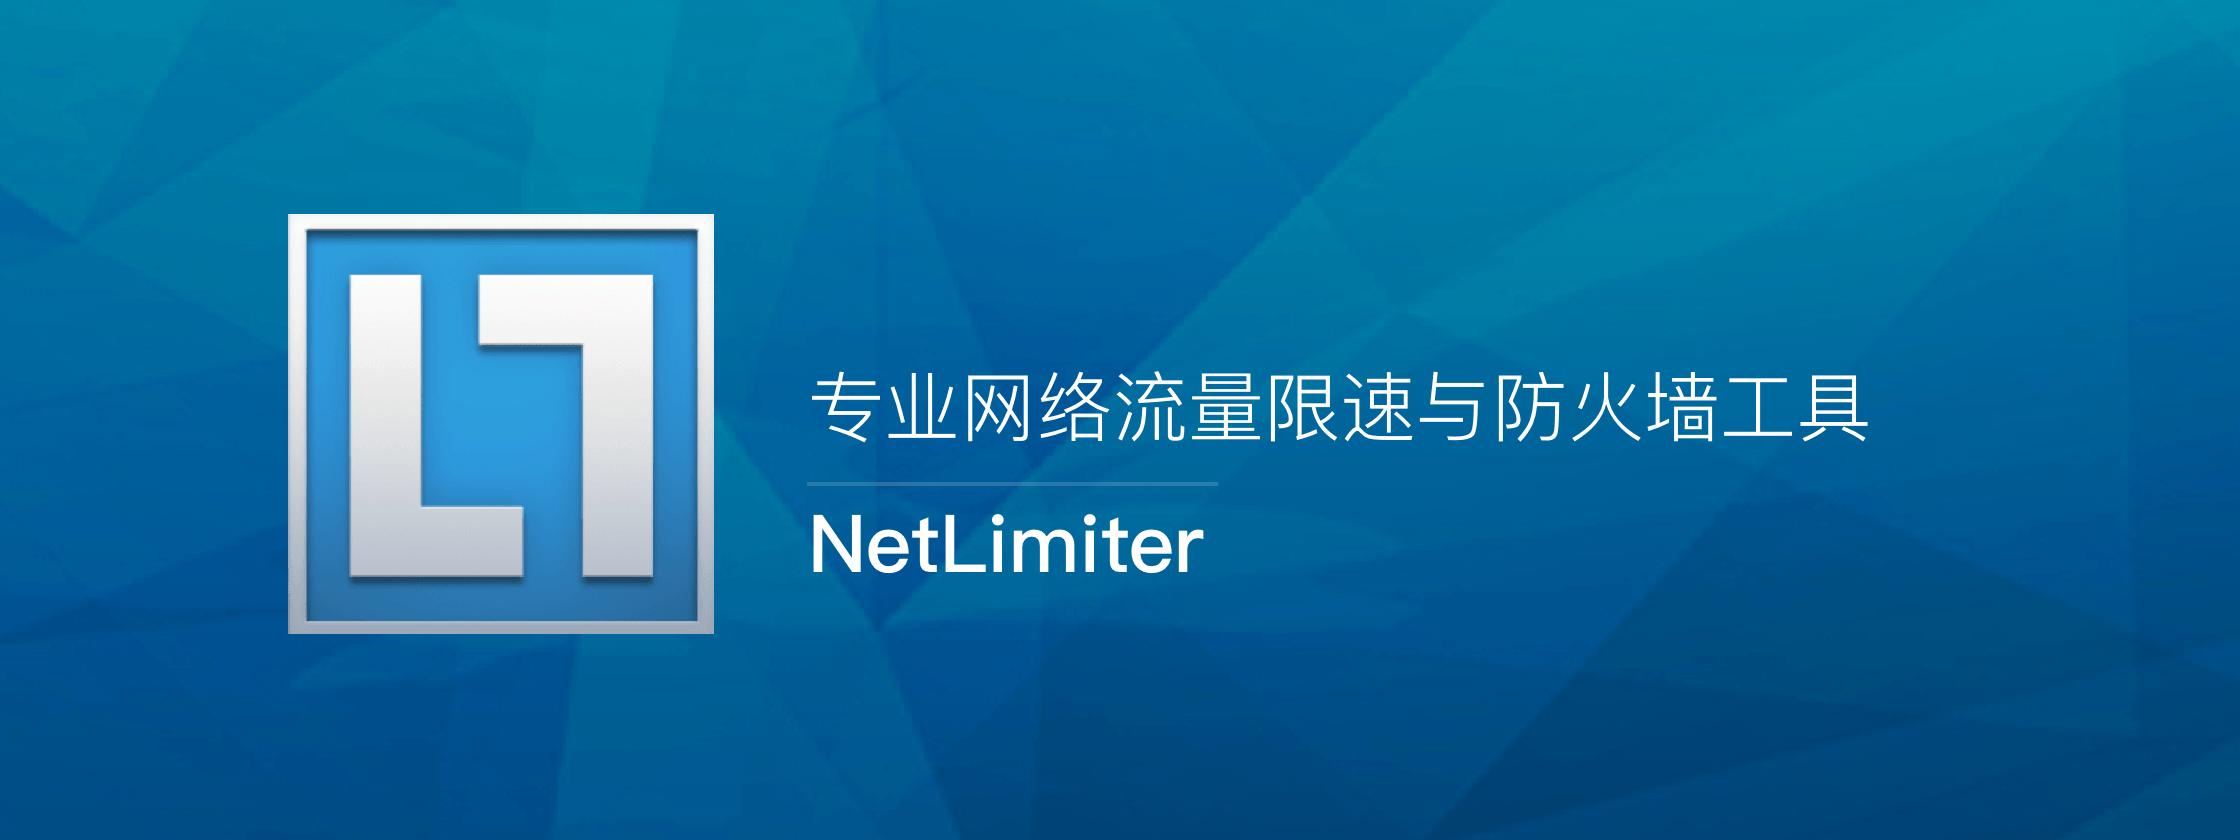 NetLimiter – 专业网络流量限速与防火墙工具